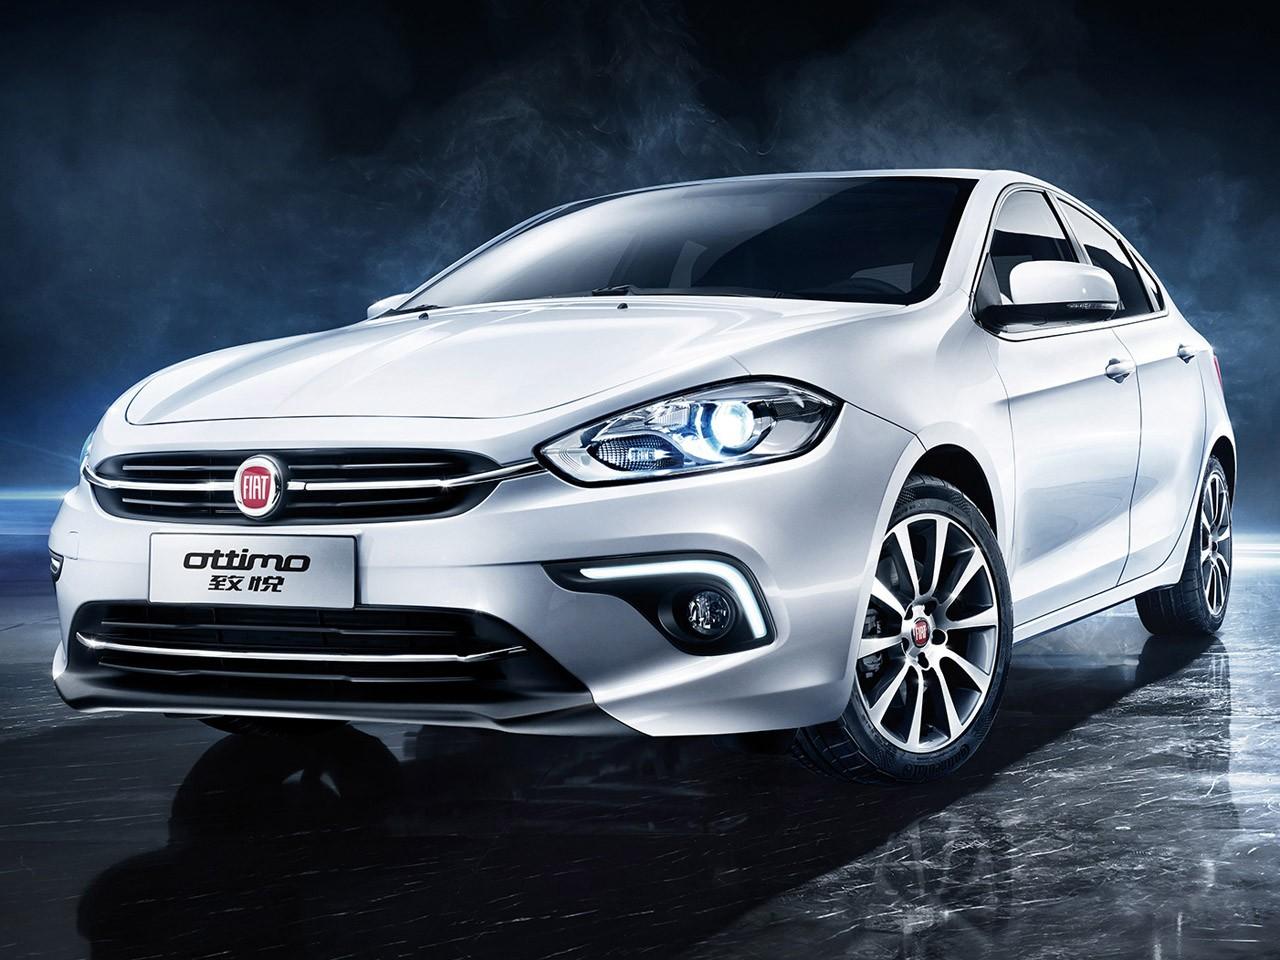 2014 Fiat Ottimo